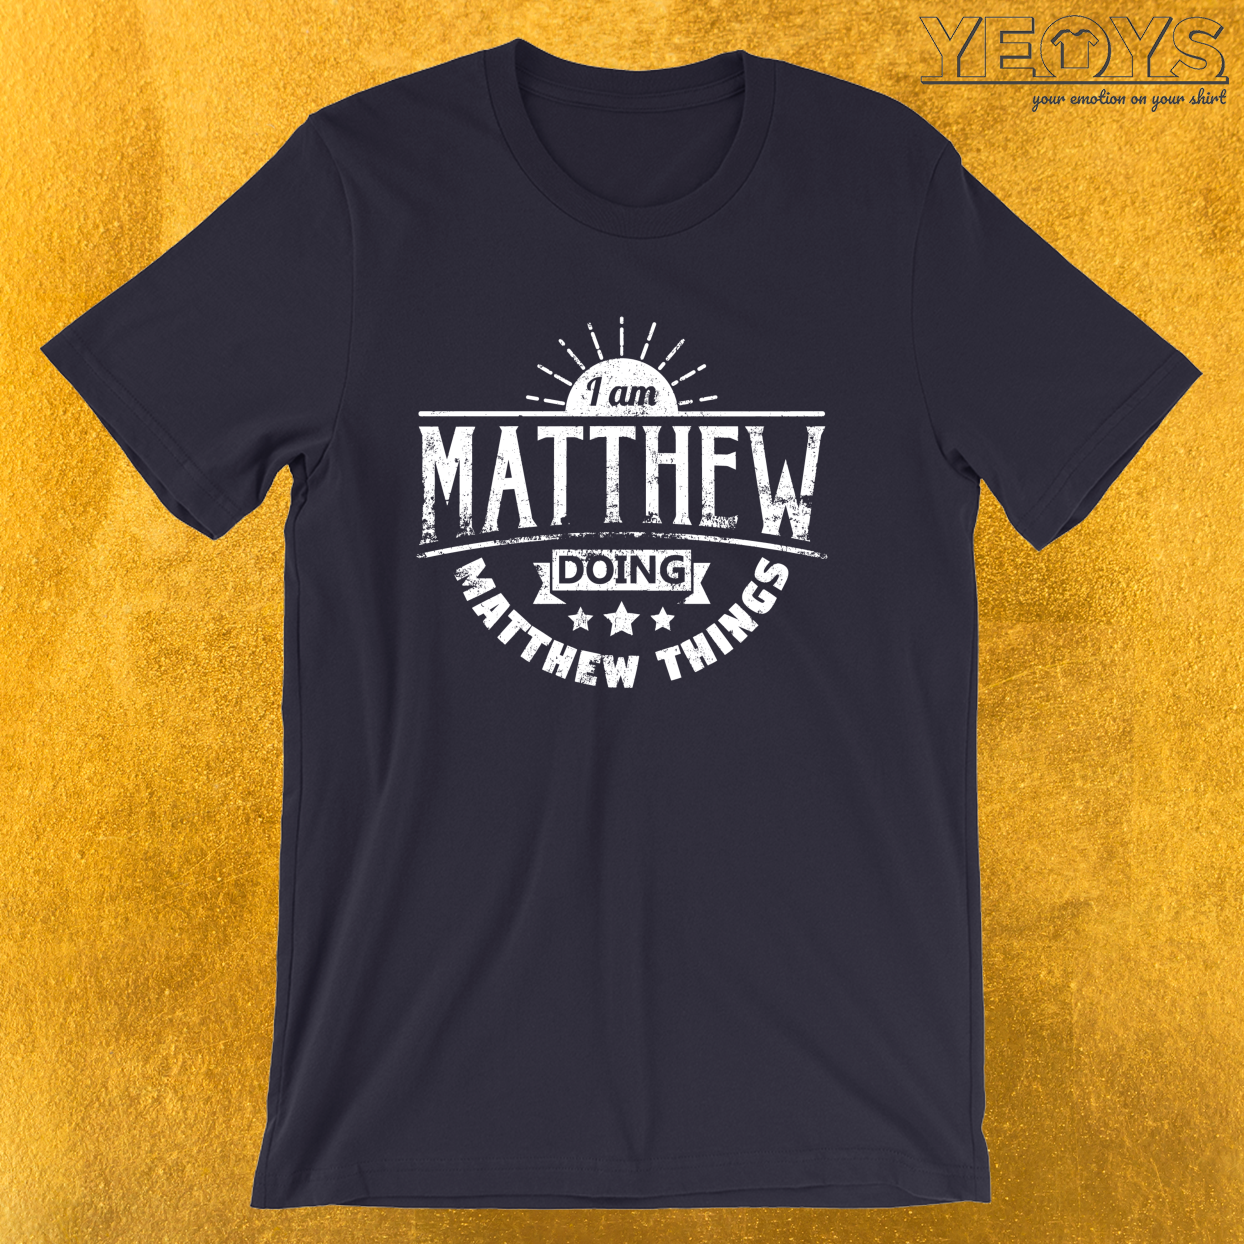 I Am Matthew Doing Matthew Things – Humorous Quotes Tee